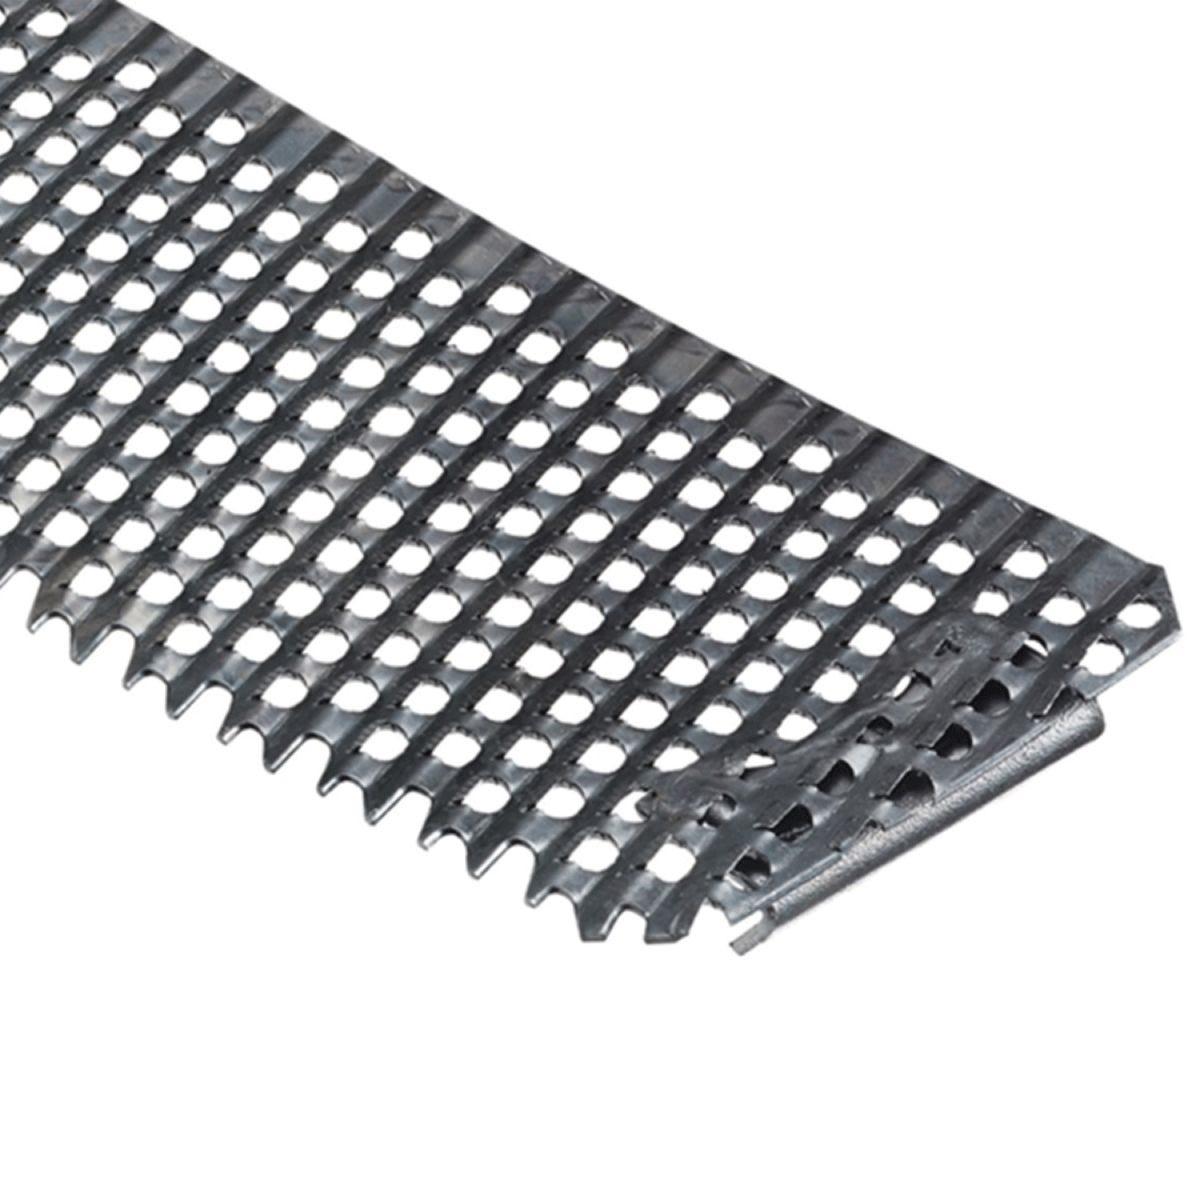 Stanley 140mm Surform Standard Cut Blade